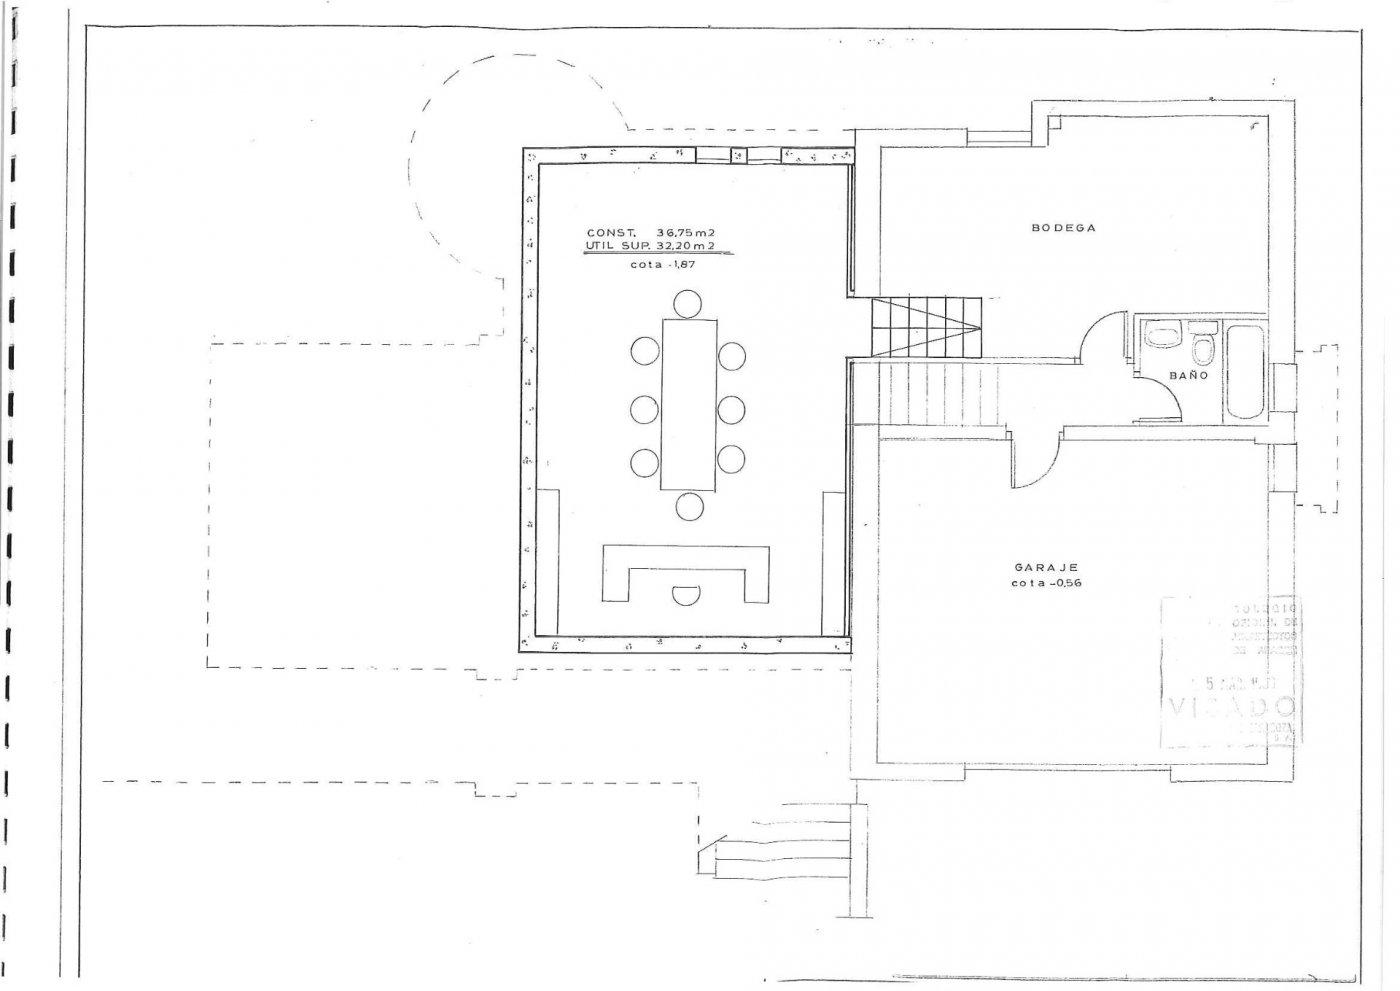 Parcela lateral de 600m2 con casa de 267m2 útiles  de vivienda mas garaje anejo de 45m2 út - imagenInmueble31